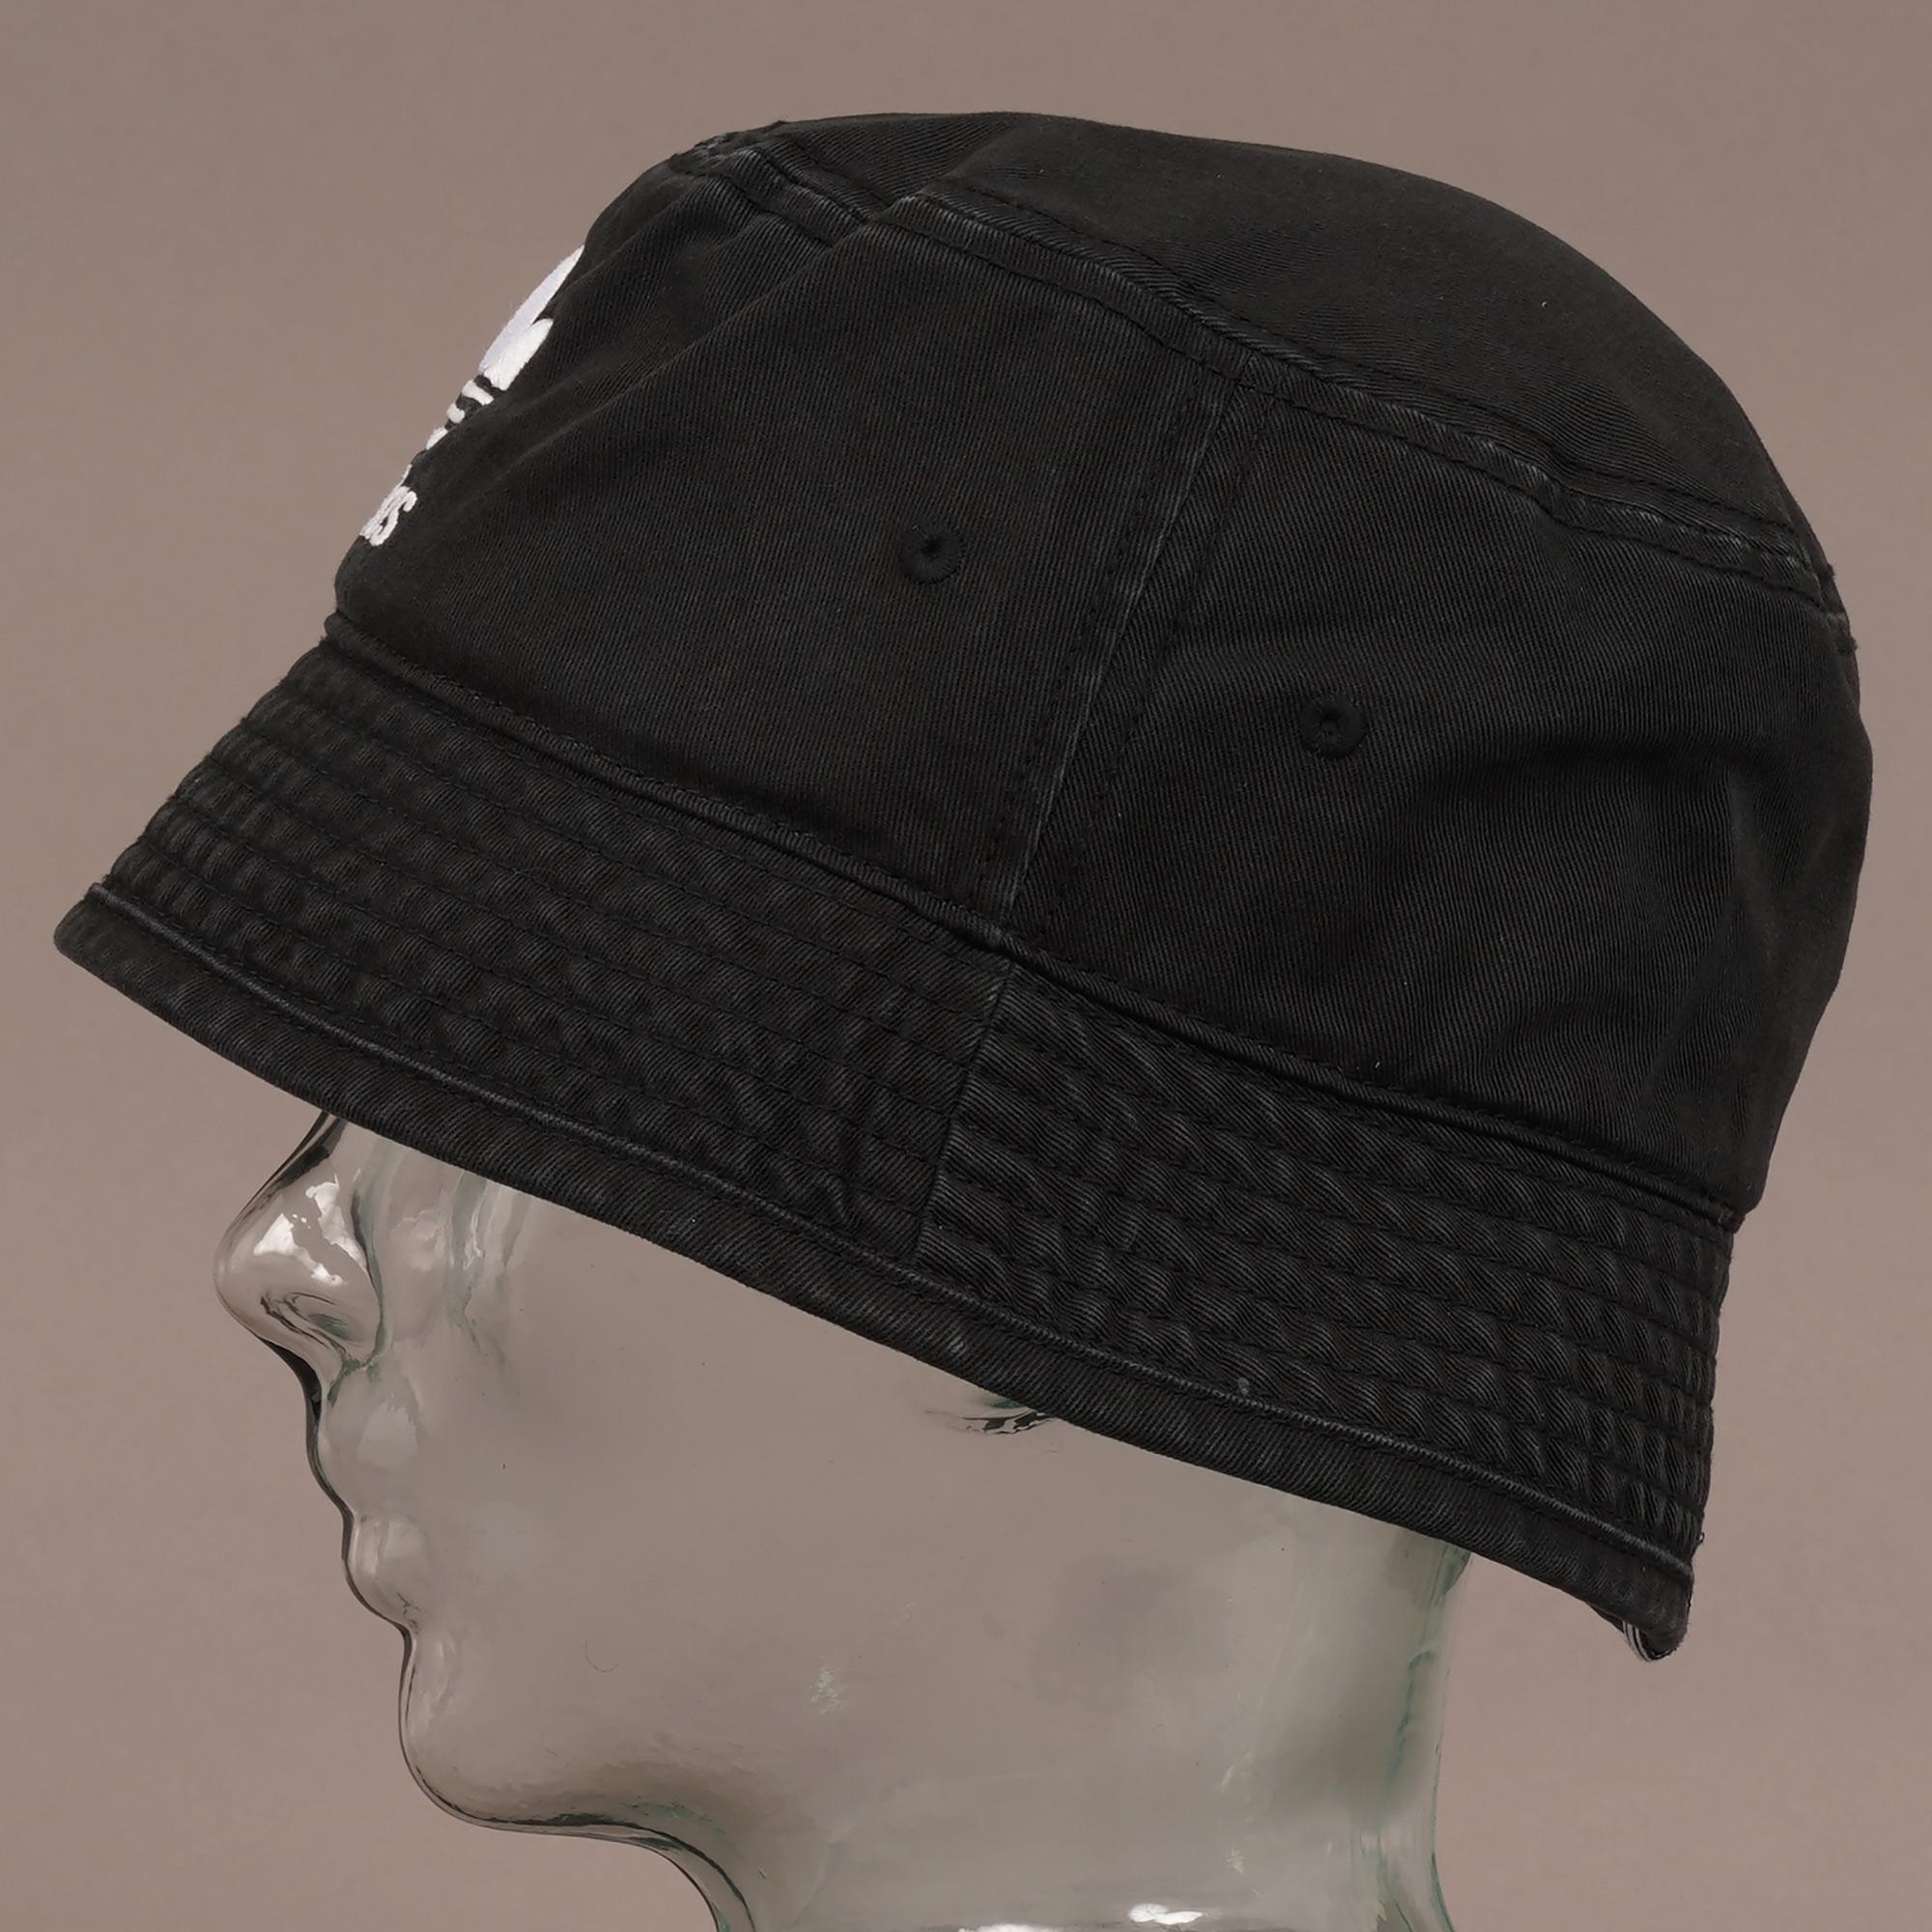 44fb8987d30 Adidas Originals Trefoil Bucket Hat Black In For Men Lyst